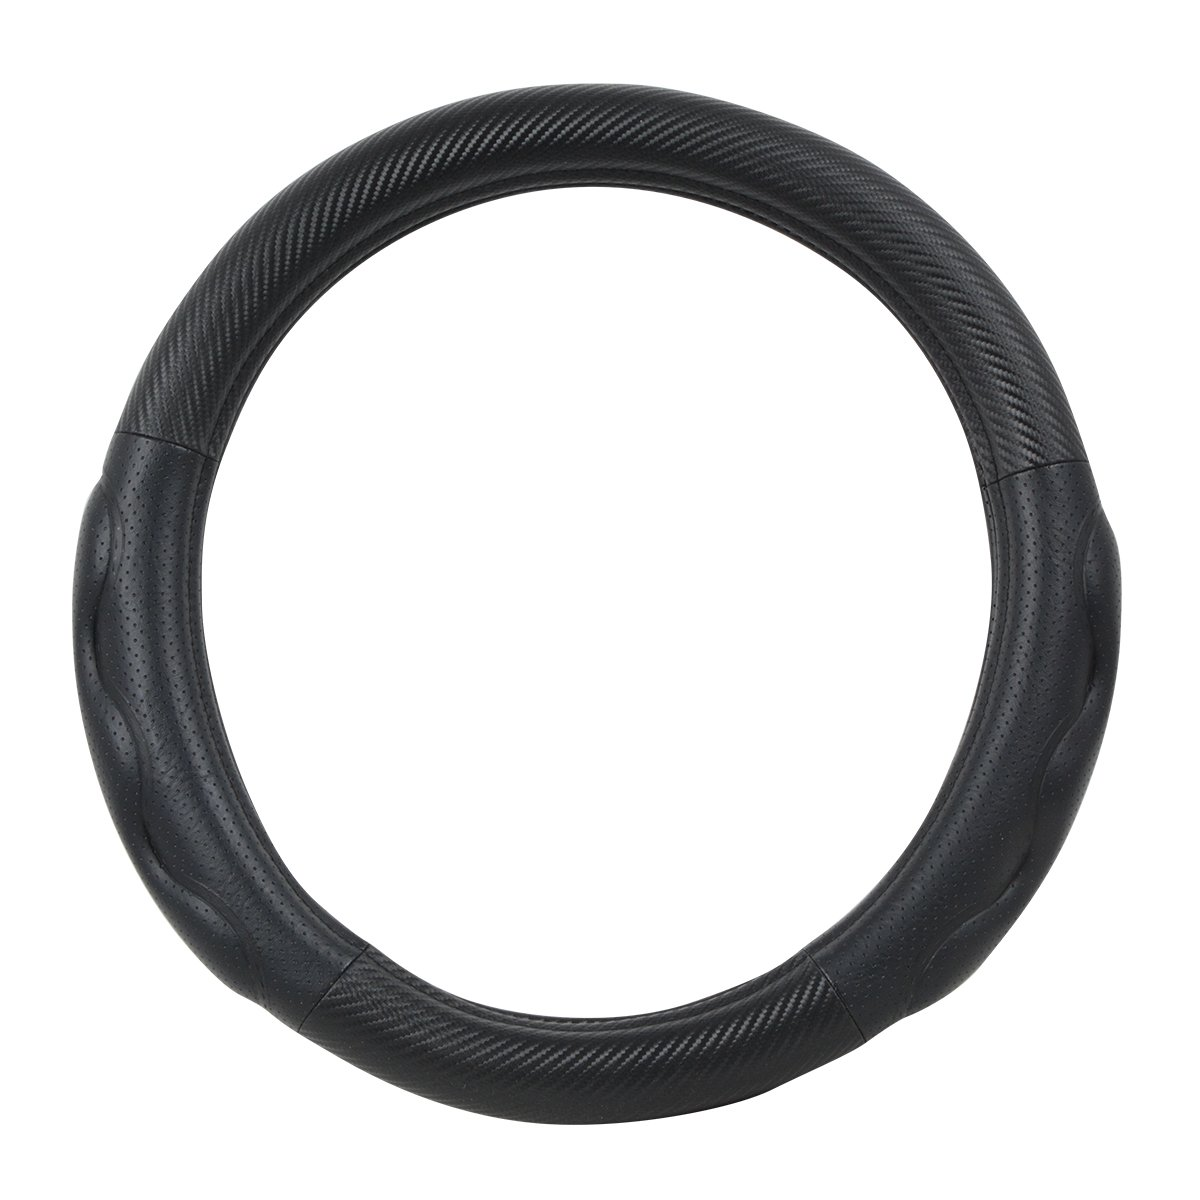 GG Grand General 54059 Matte carbon fiber Steerling Wheel Cover